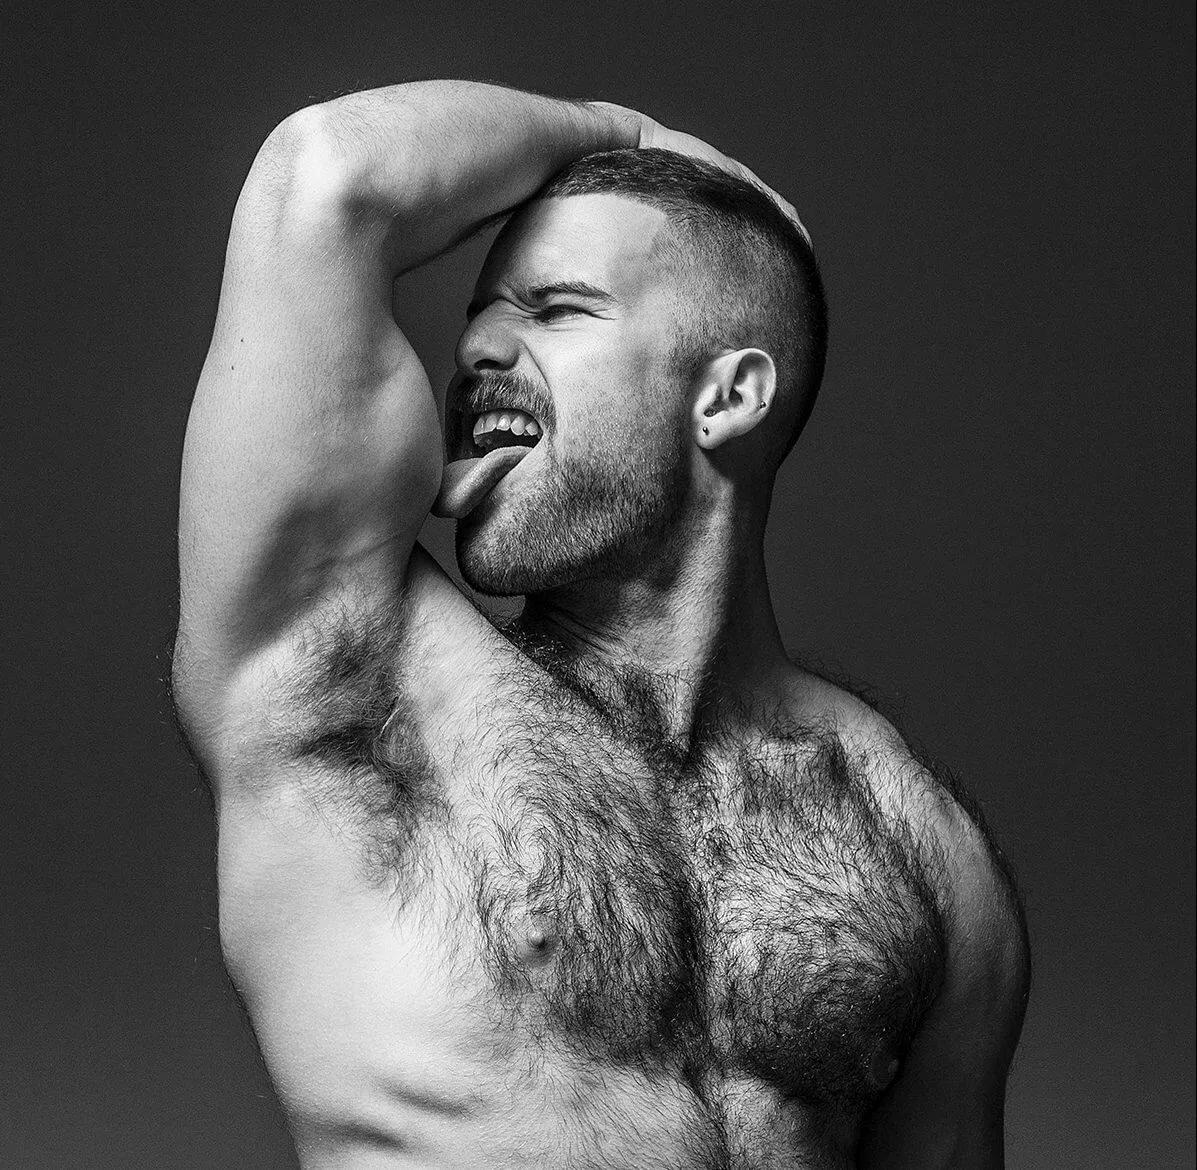 Hairy men thumbnails